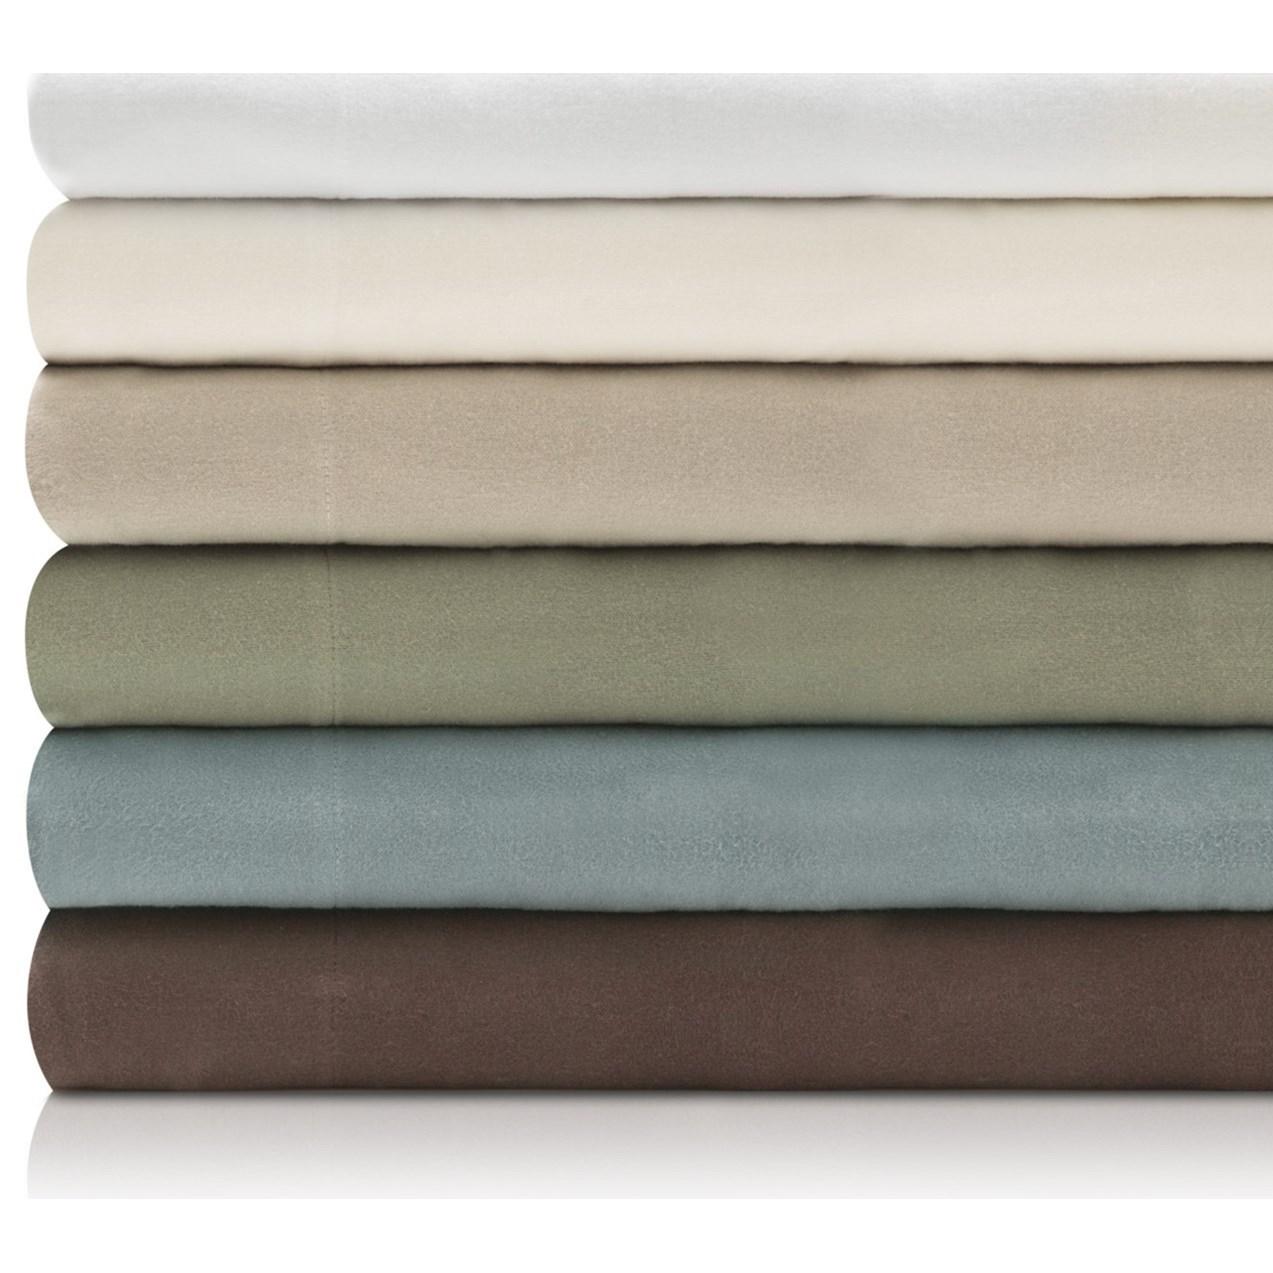 Malouf Portuguese Flannel King Woven™ Portuguese Flannel Sheet Set - Item Number: WO19KKIVFS